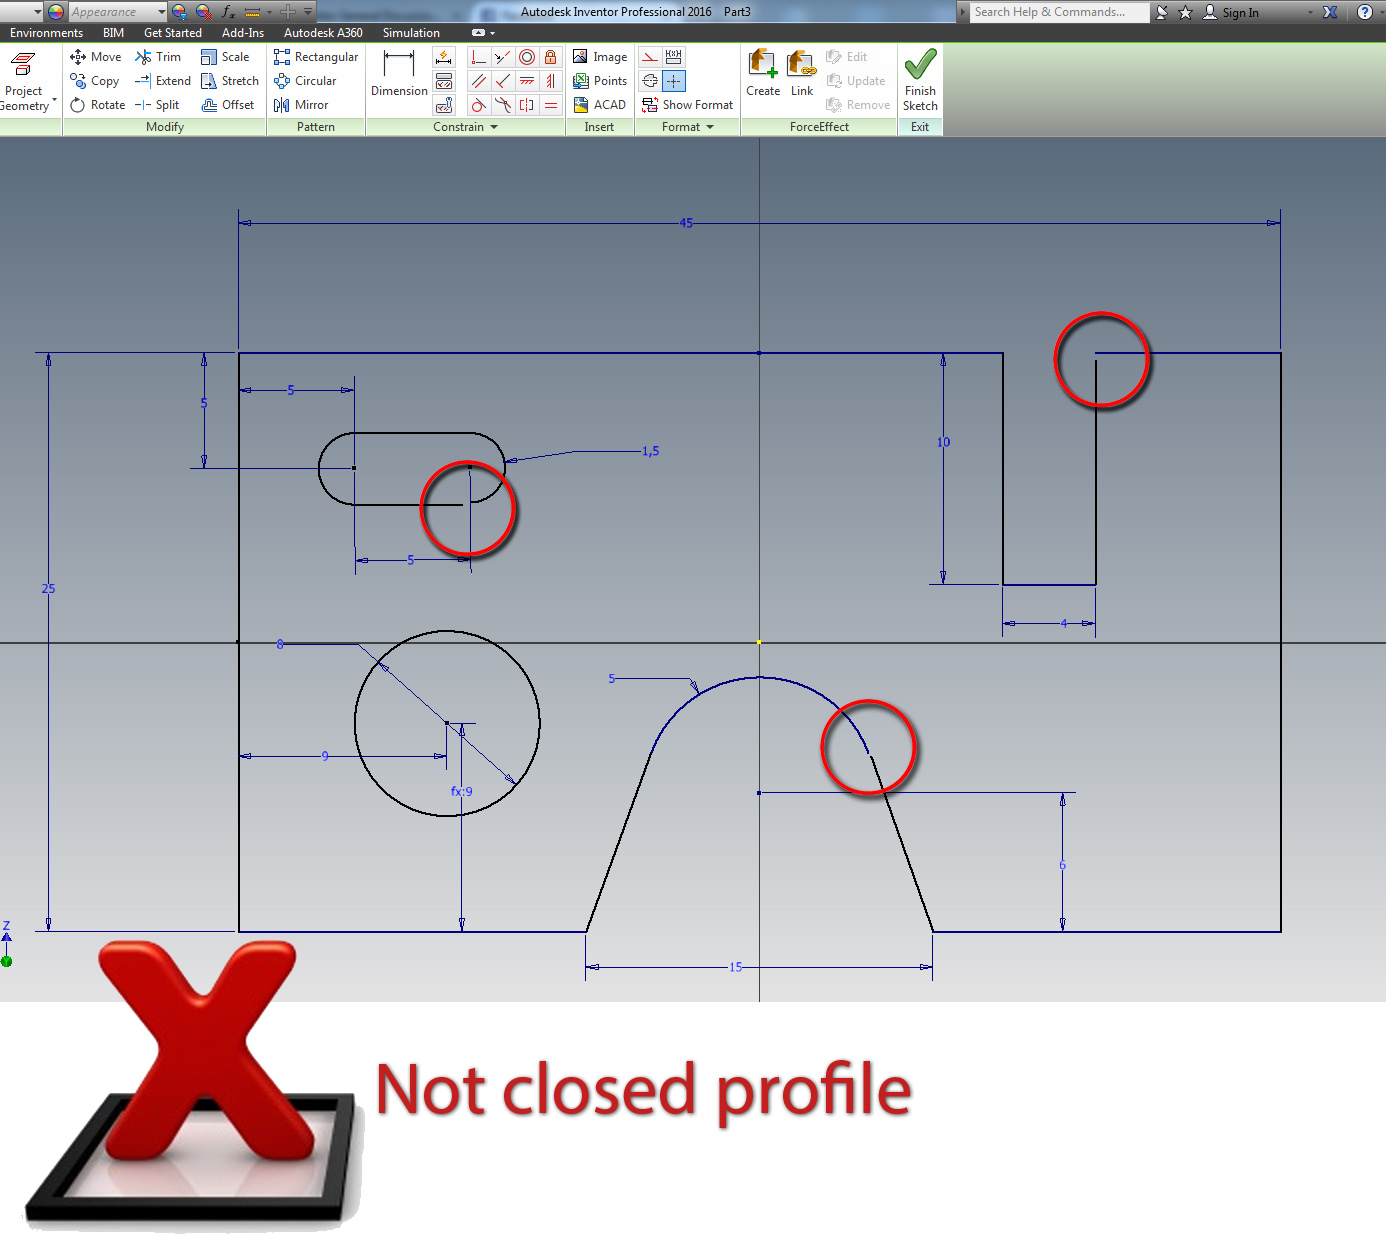 Sketch Closed Profile - Indicator - Autodesk Community